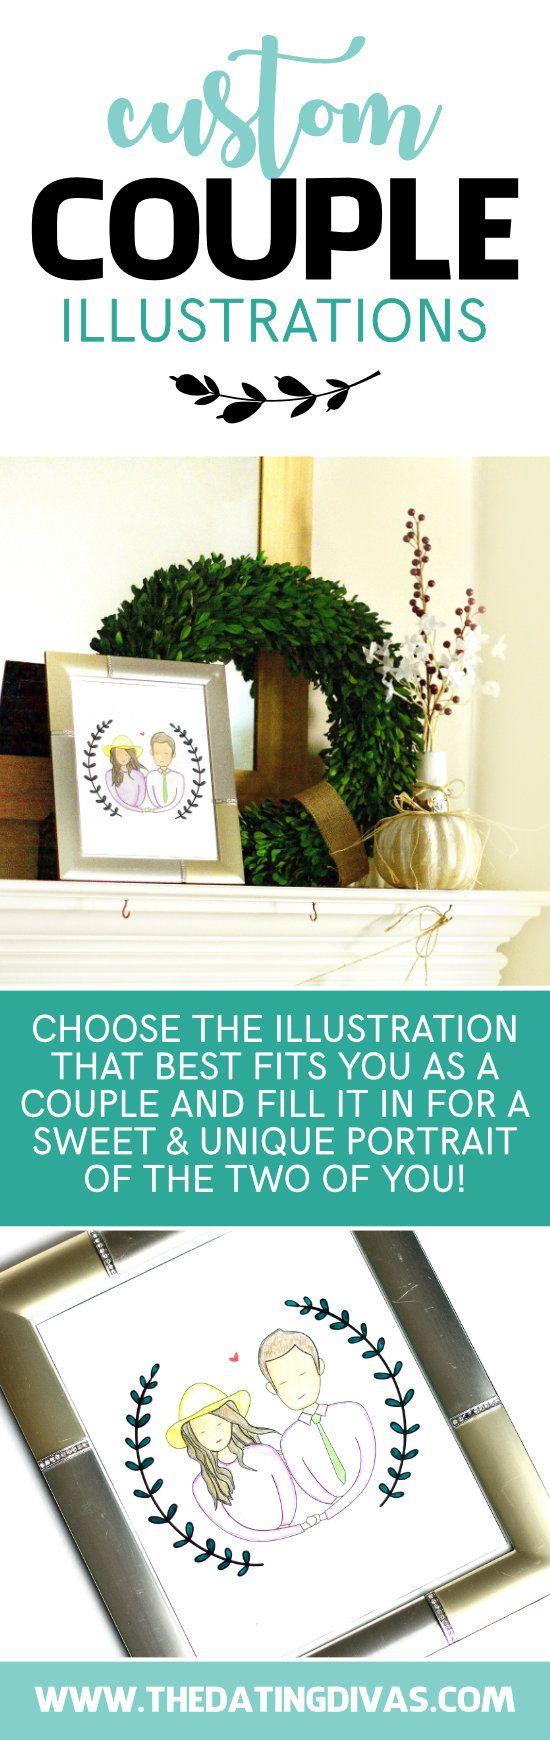 Custom Couple Illustrations Custom Couple Illustration Couple Illustration Diy Projects For Couples